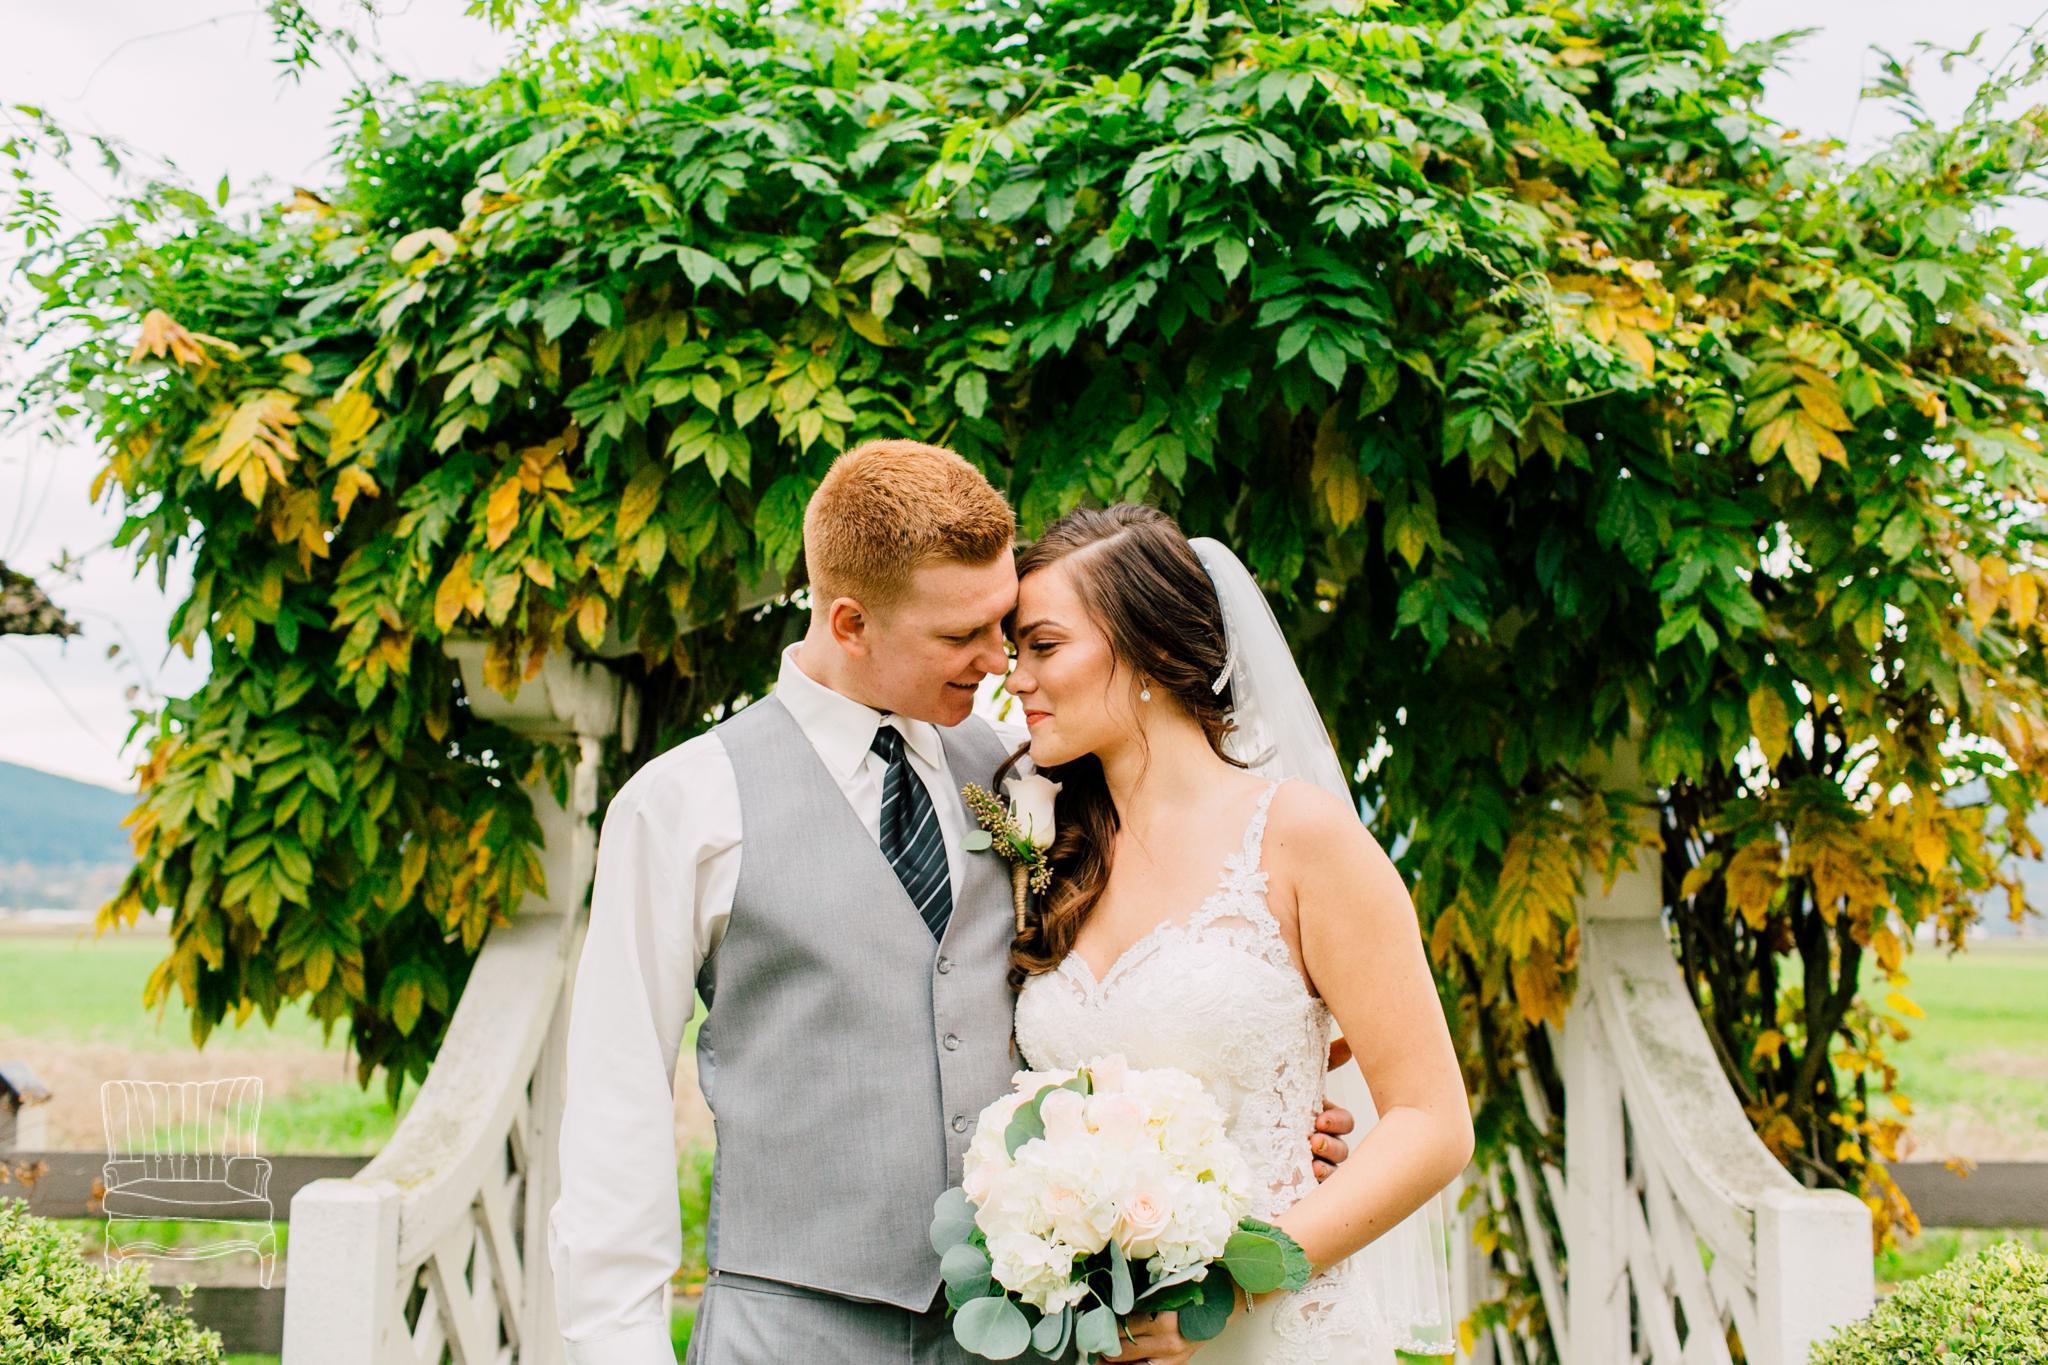 maplehurst-farm-wedding-skagit-valley-katheryn-moran-photography-9.jpg